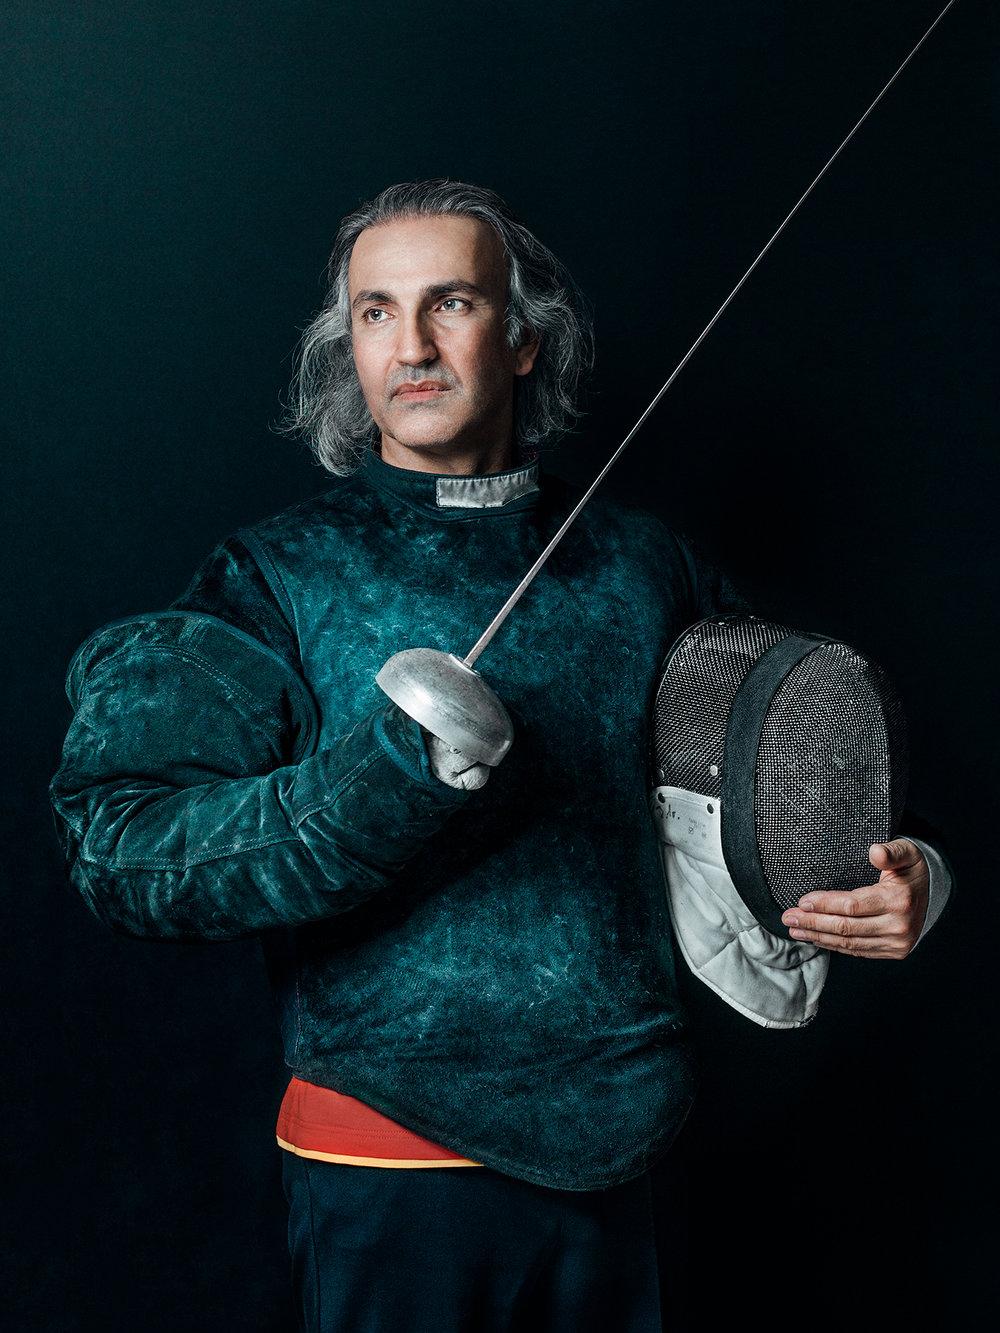 Oscar-arribas-esgrima-maestro-fencing-master-fencer-fechten-scherma-escrime-portrait-fotografo-retrato-photographer006.jpg